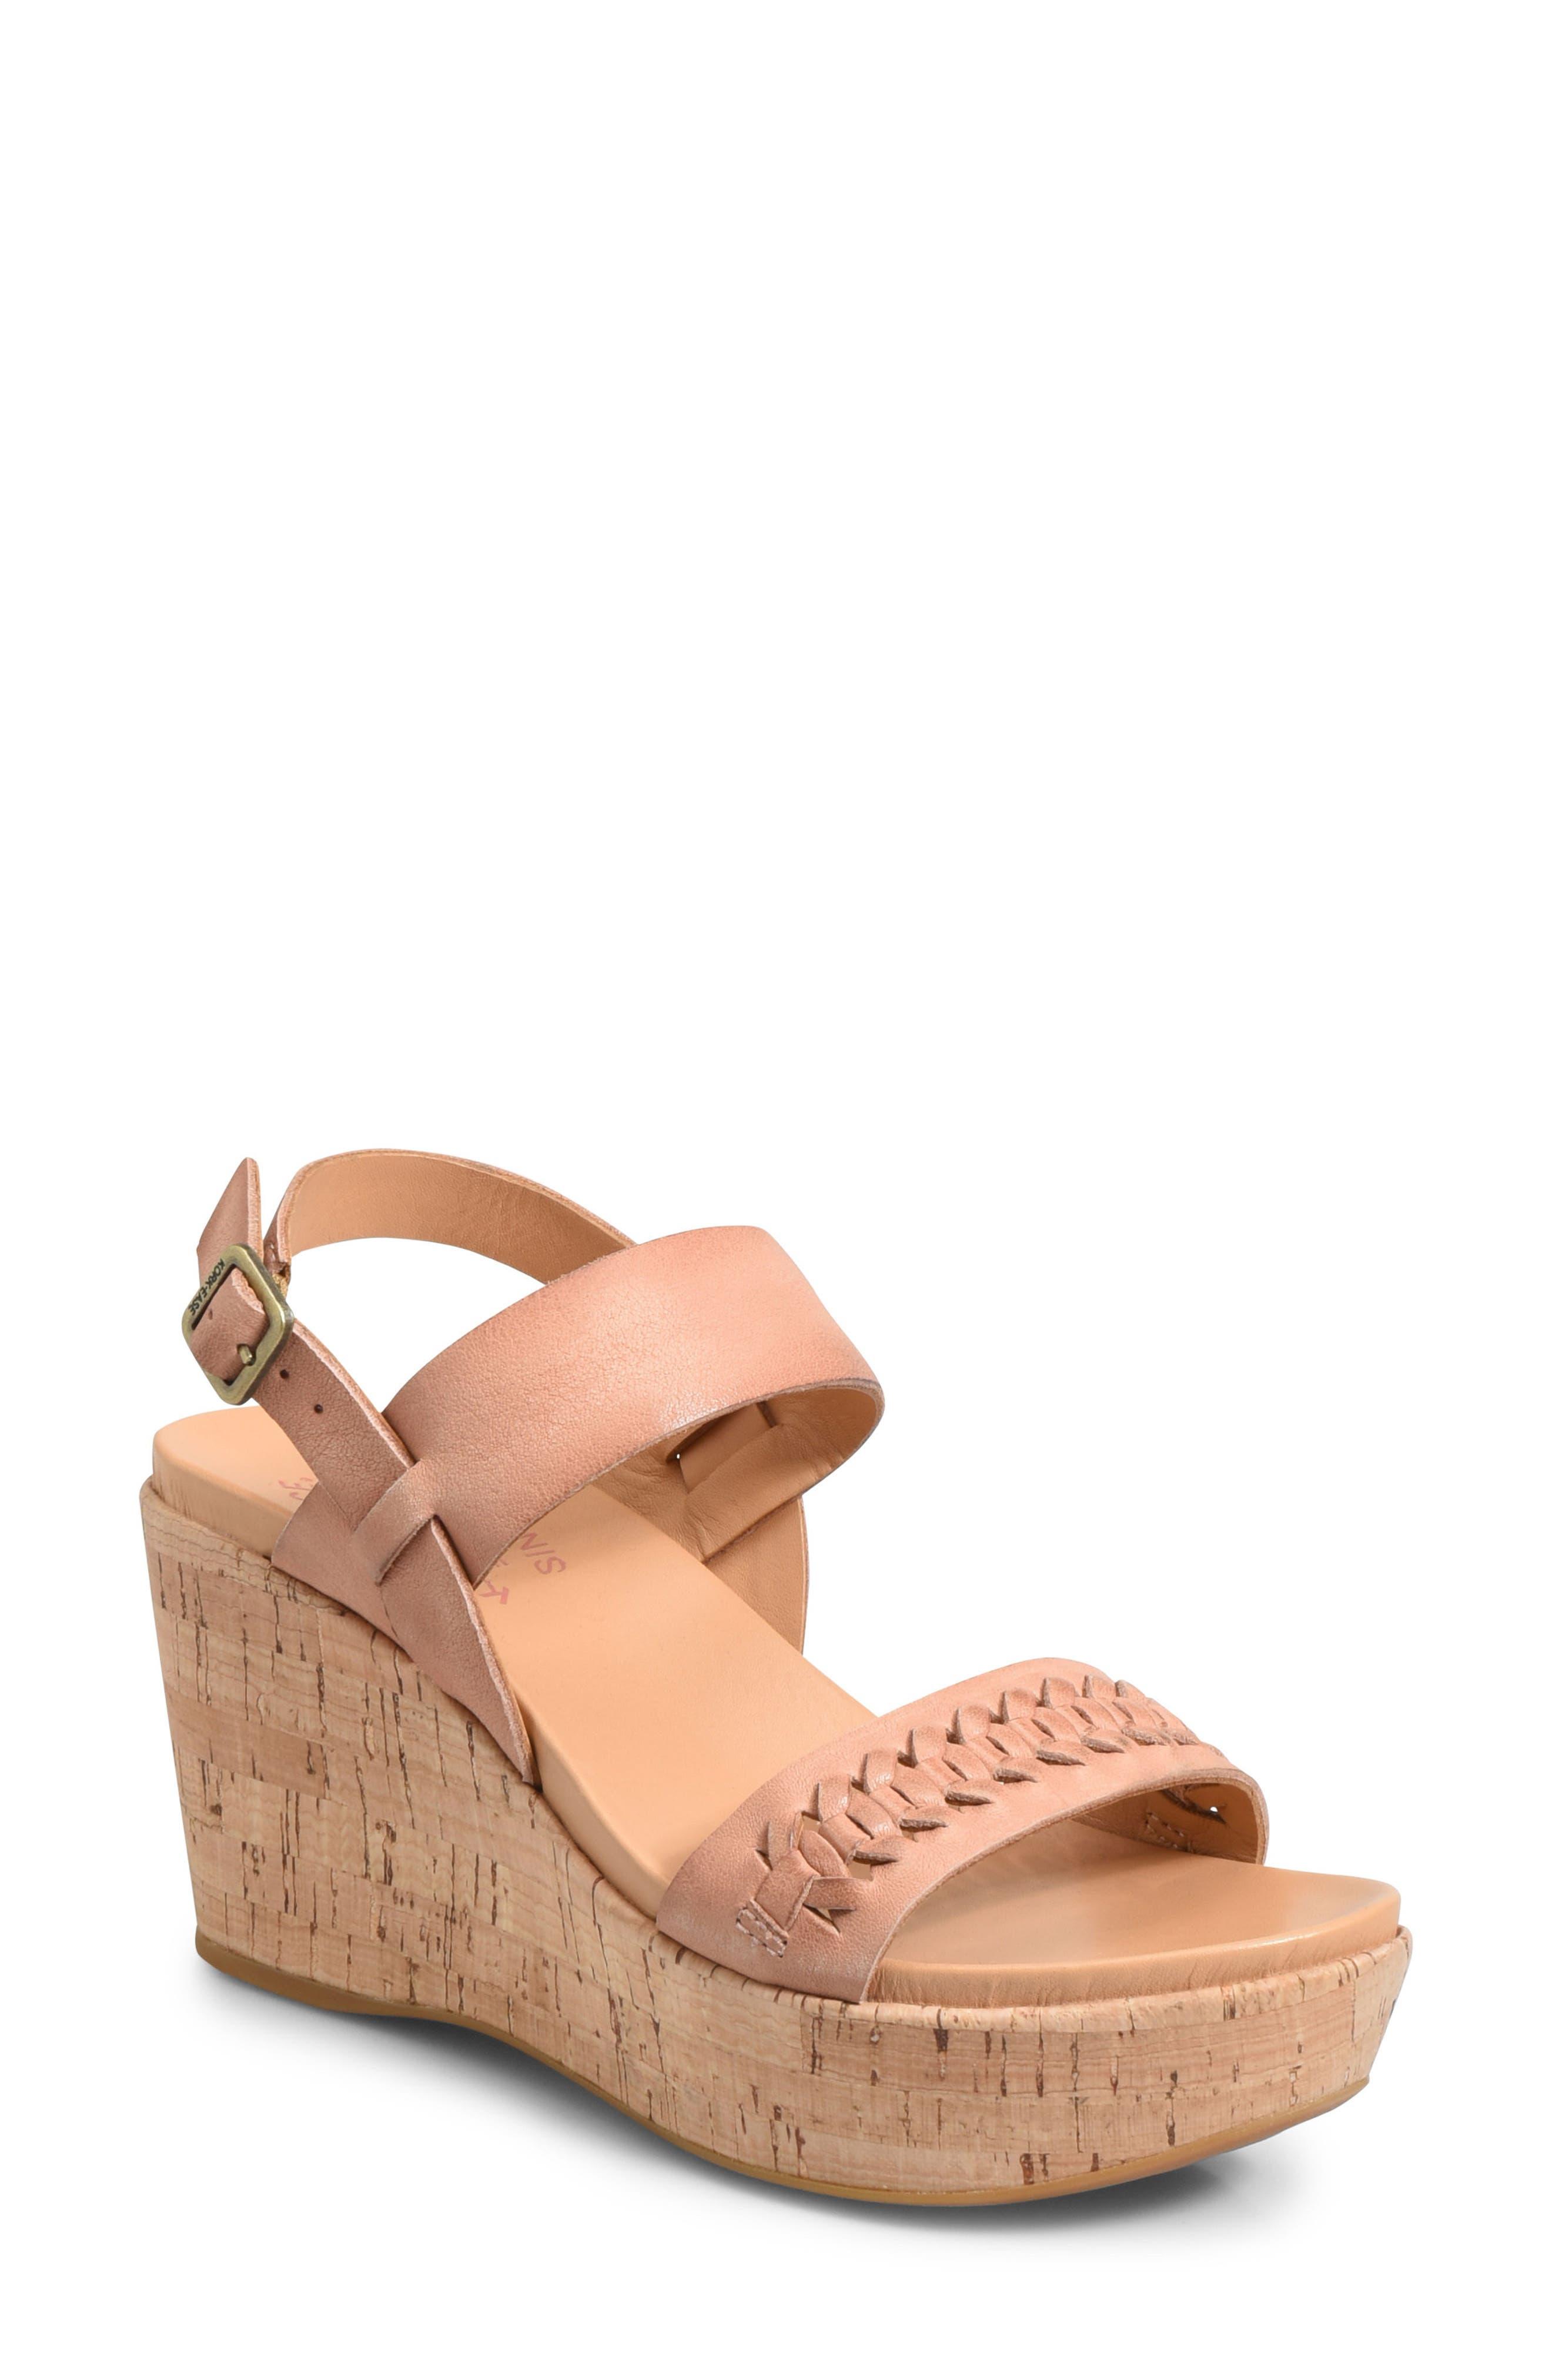 Kork-Ease Austin Braid Wedge Sandal, Pink